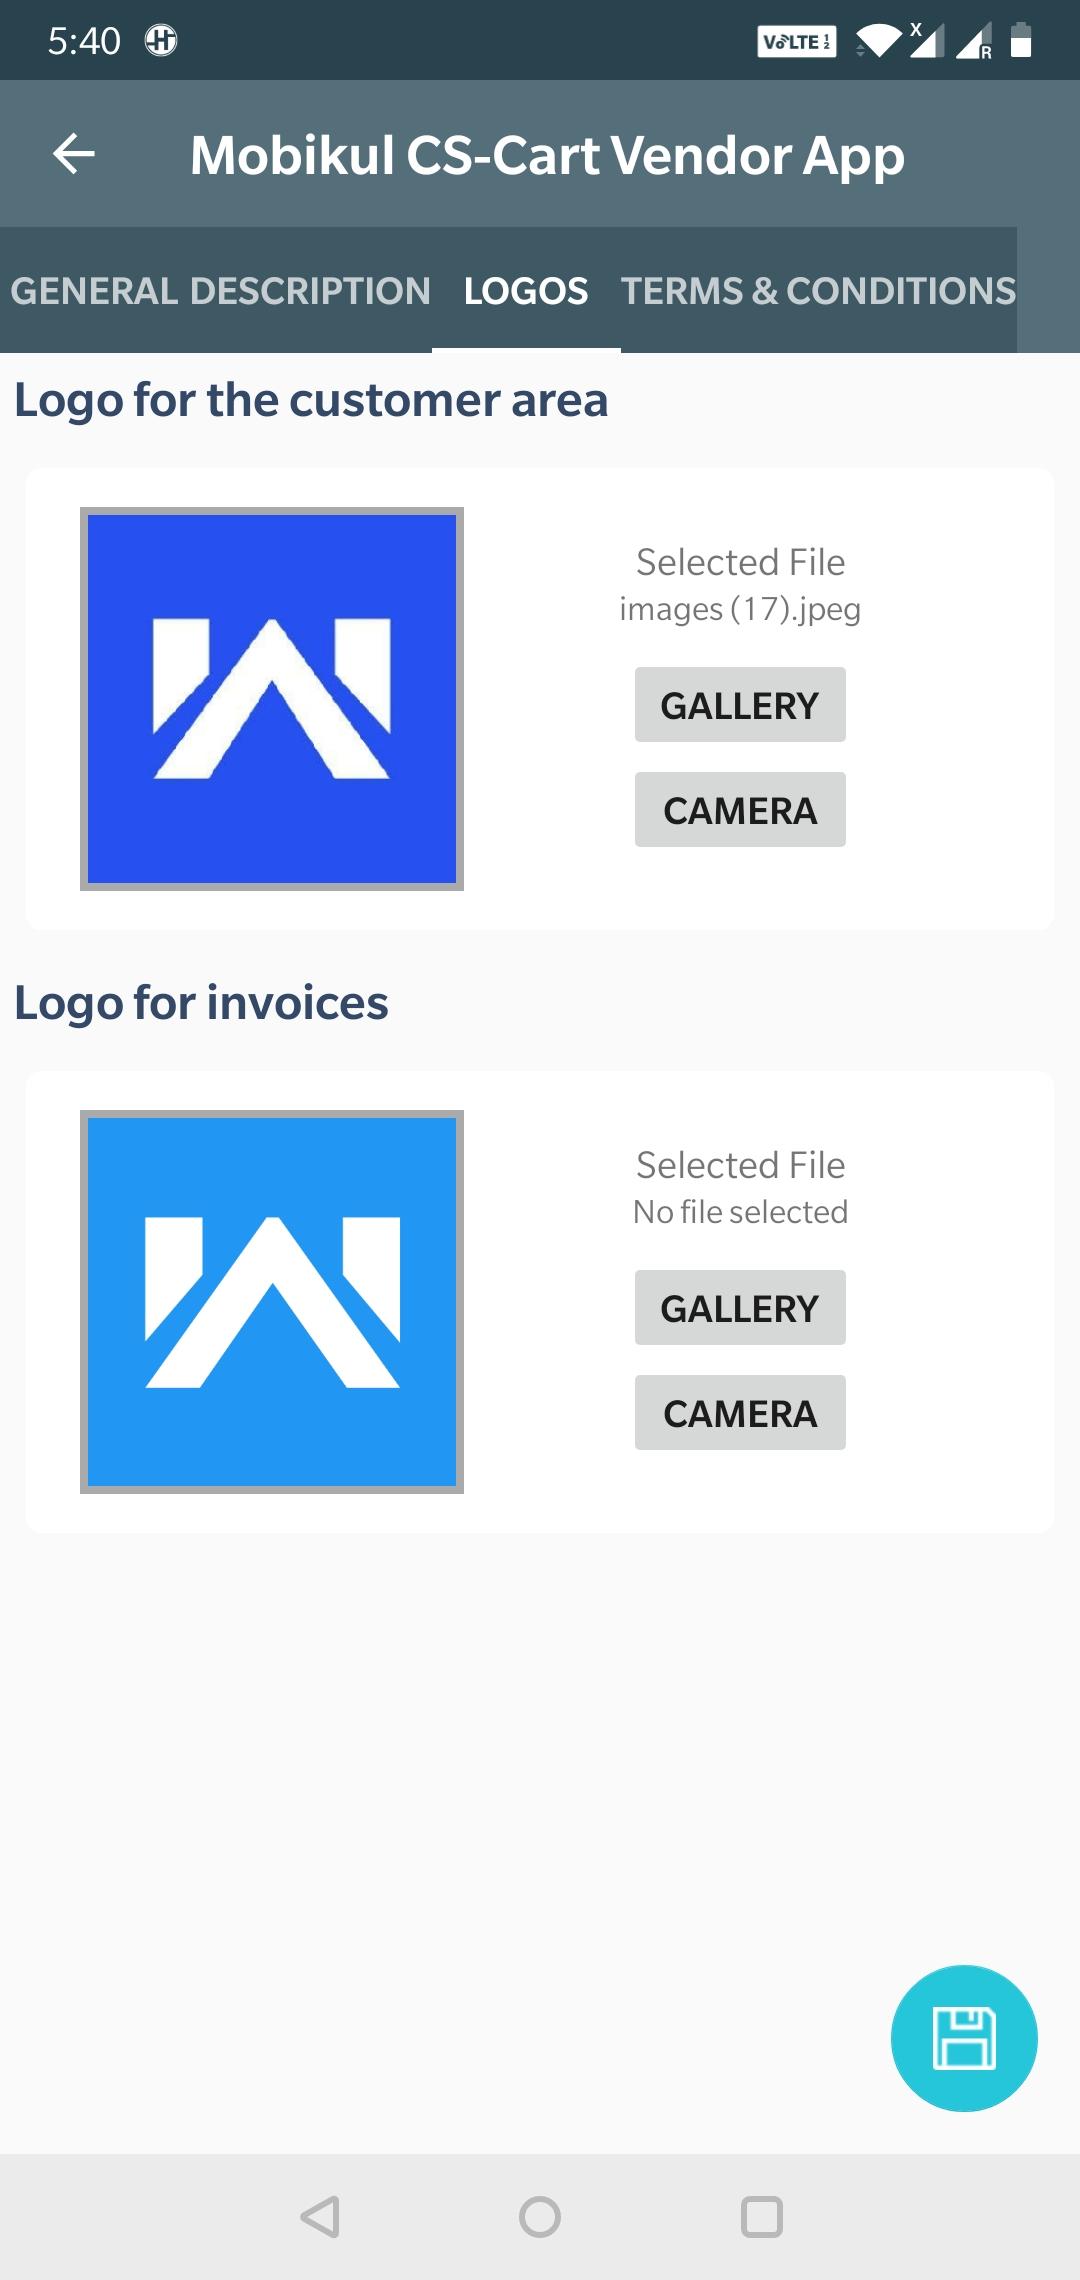 webkul-mobikul-cs-cart-vendor-app-Seller-logo-13